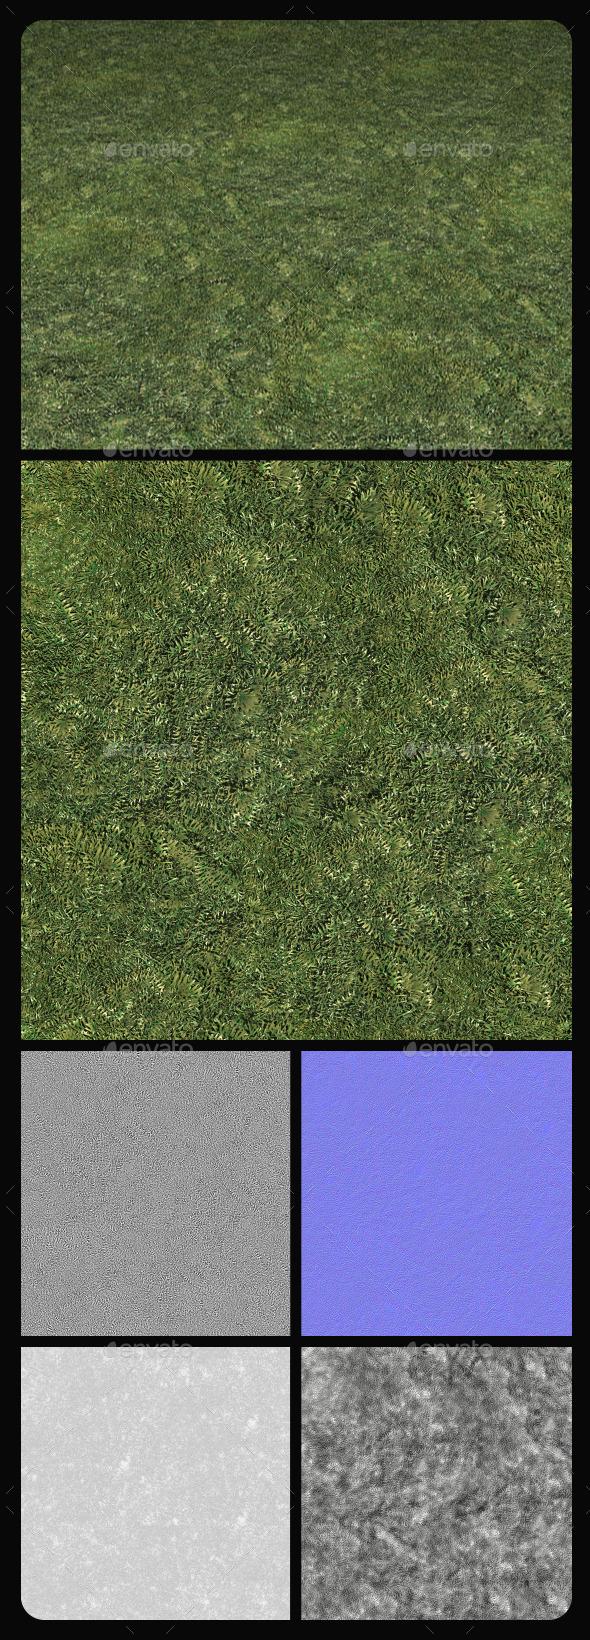 Grass Hi-Res Tile Texture - 3DOcean Item for Sale